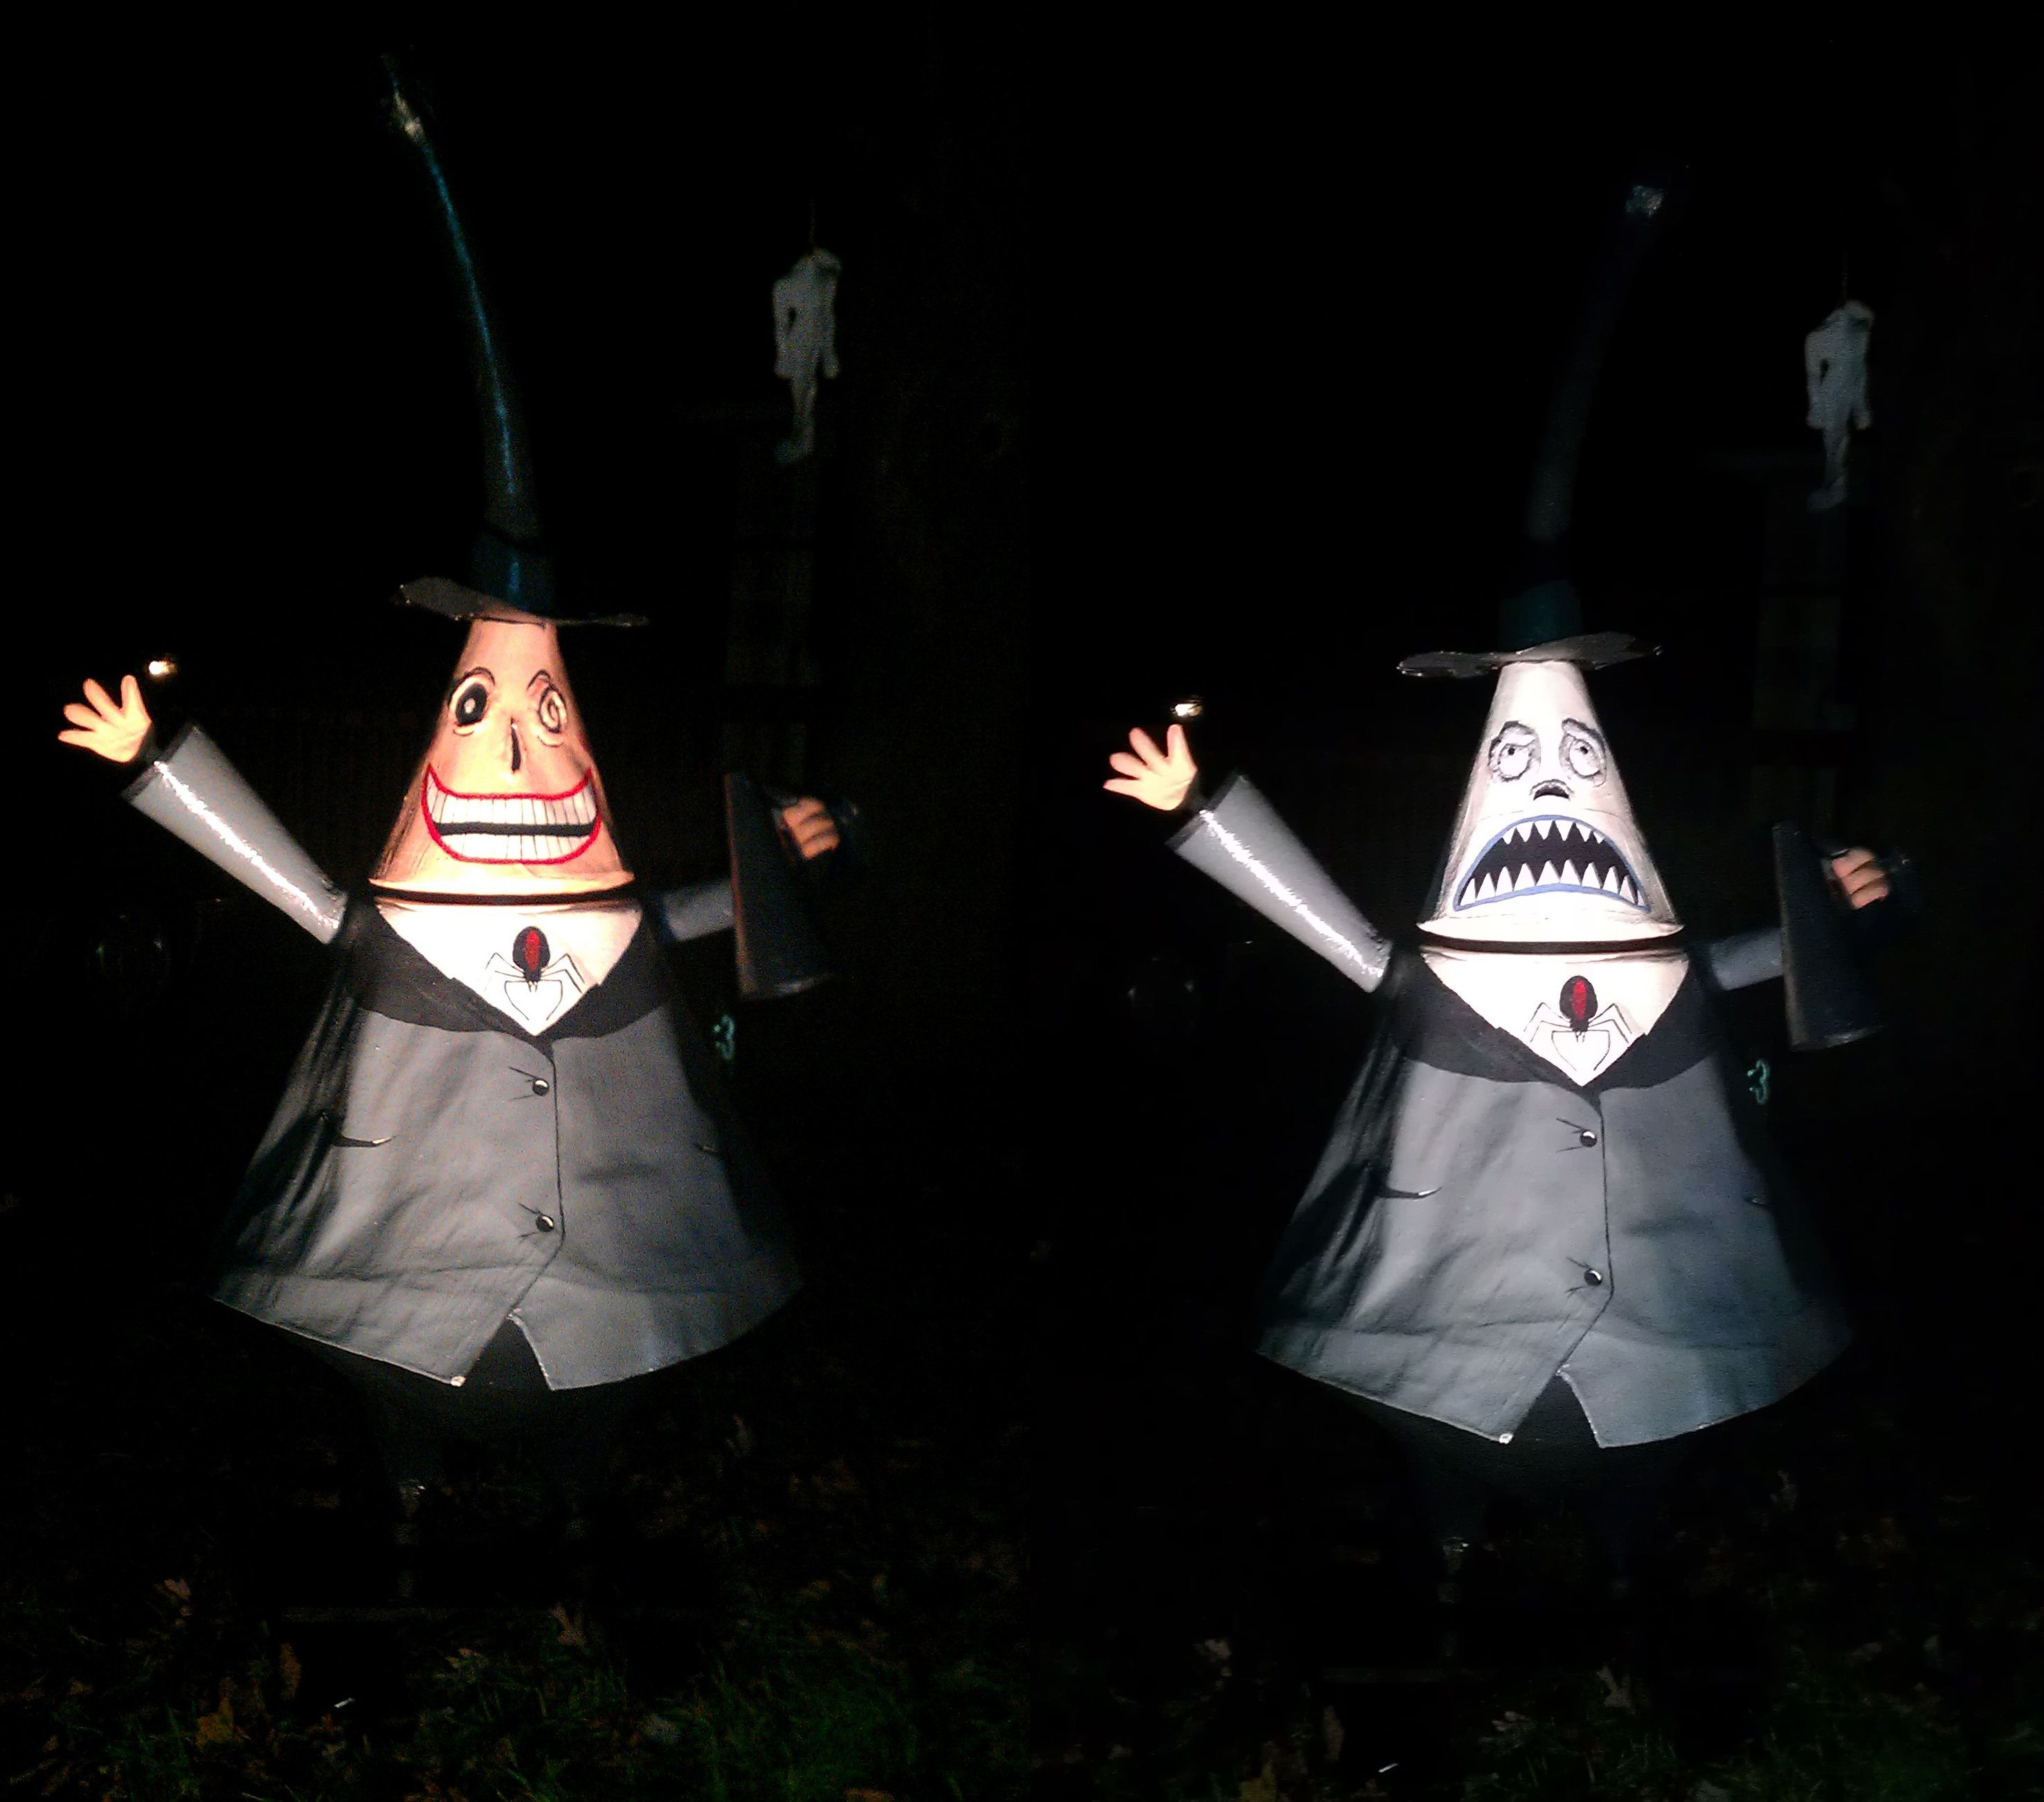 Paper Mache Nightmare Before Christmas Characters (Mayor